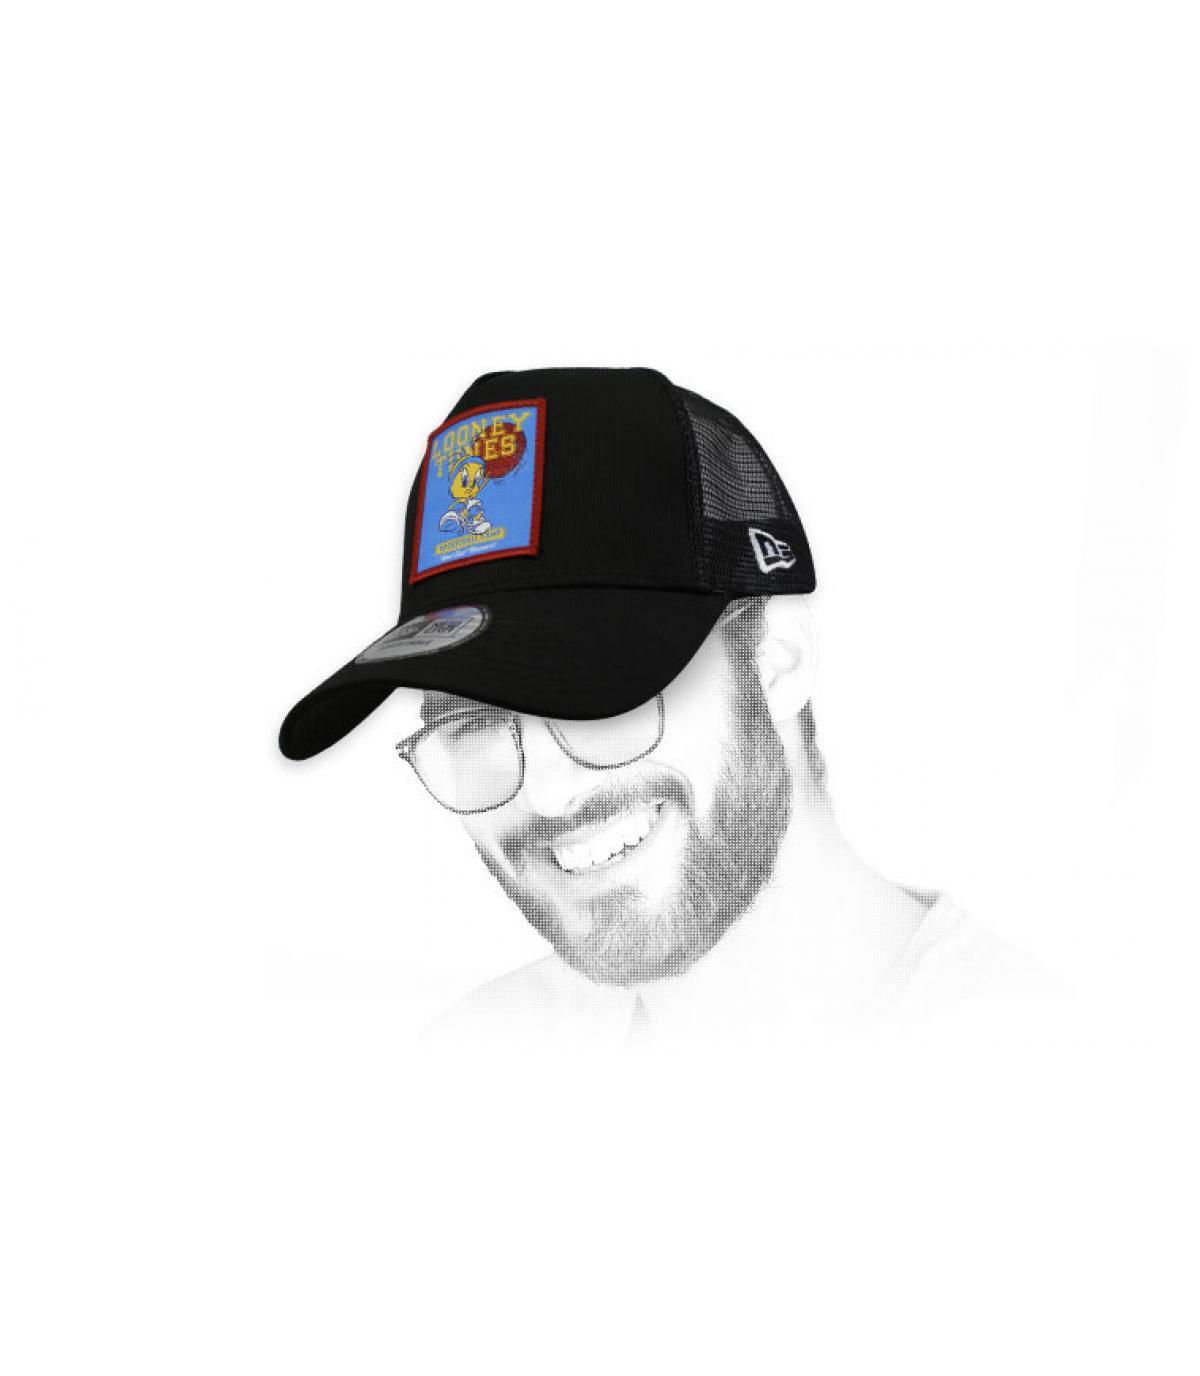 Tweety basketball cap